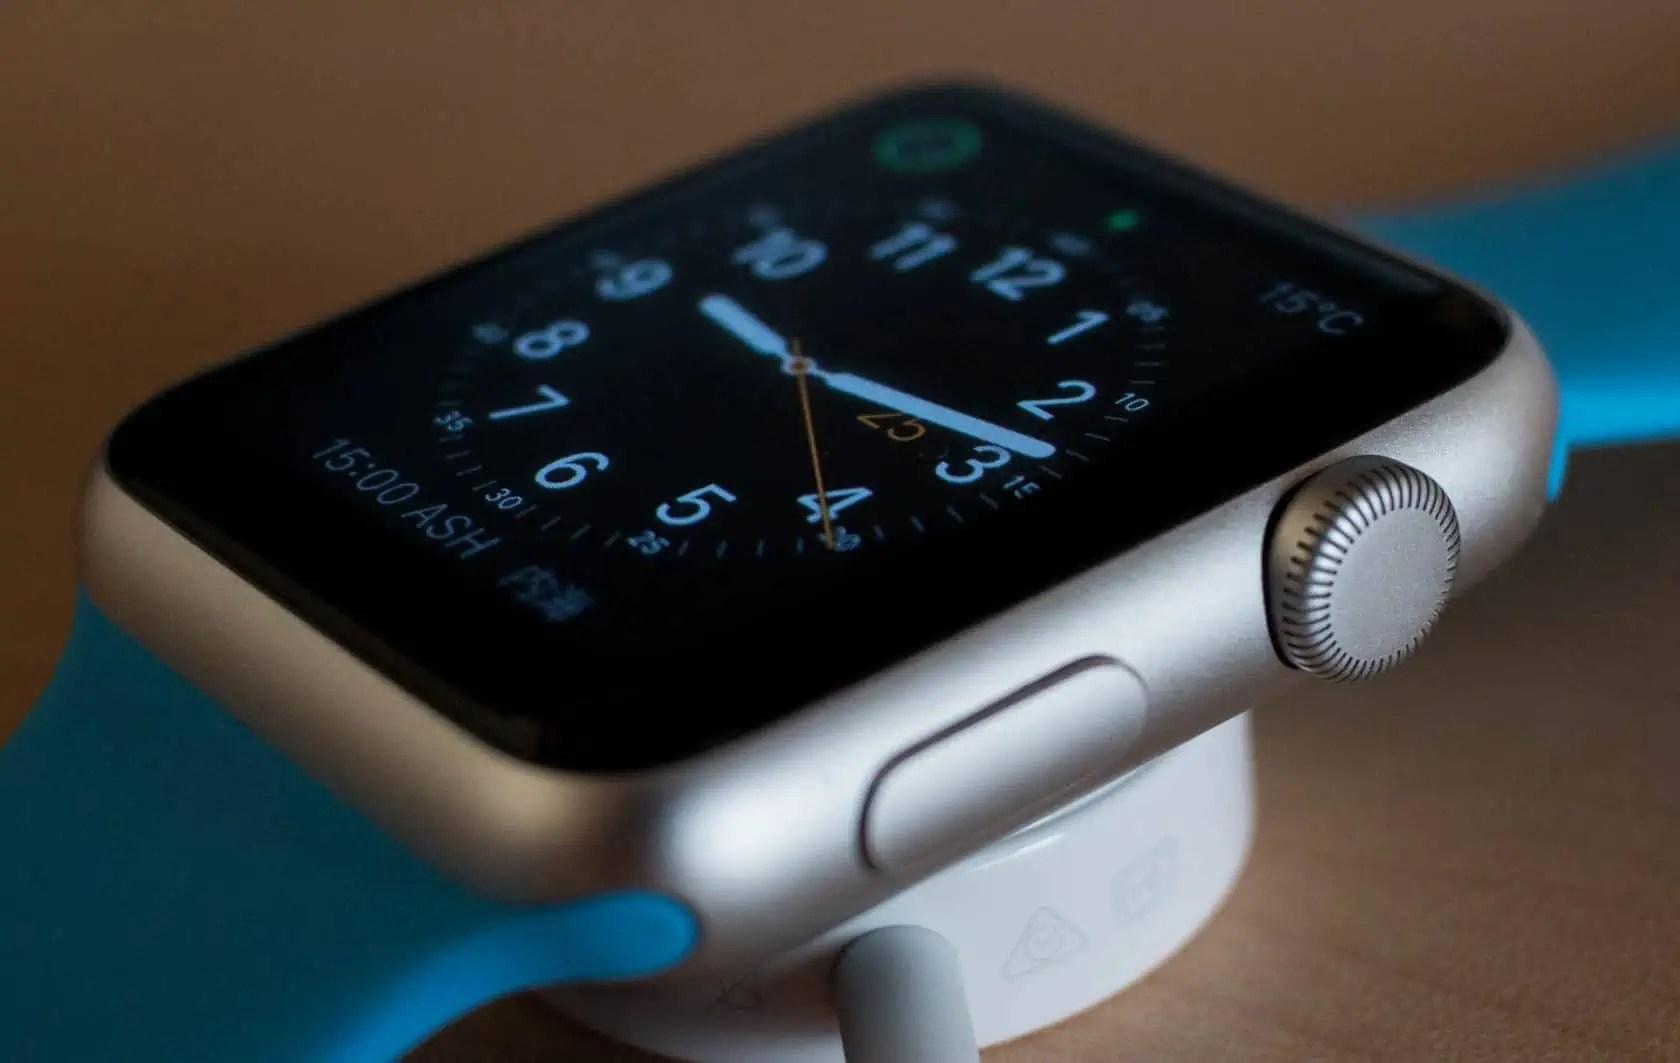 apple-equipment-gadget-277406